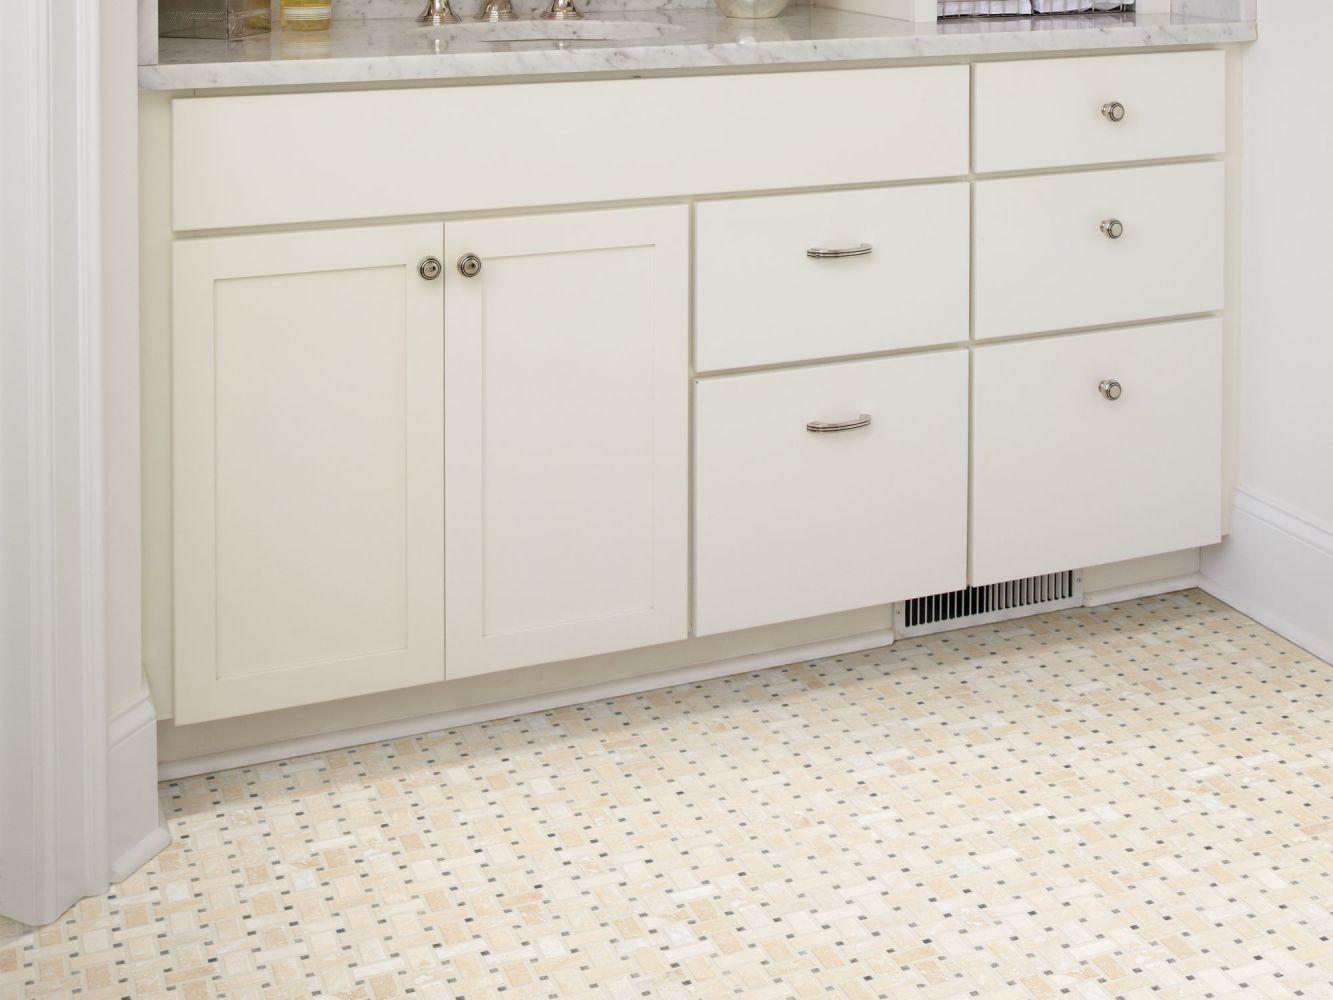 Shaw Floors Home Fn Gold Ceramic Del Ray Basketweave Mosaic Point Break 00257_TGL27